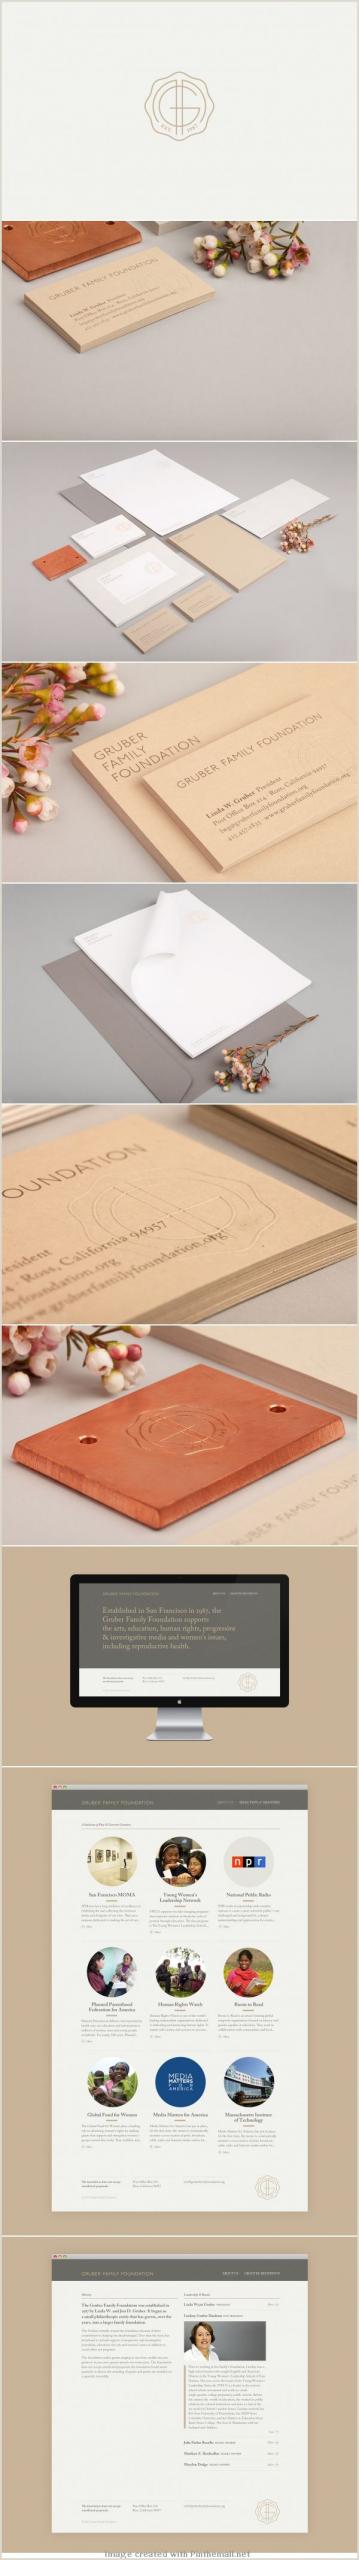 Unique Graphic Design Business Cards 14 Popular Hardwood Flooring Business Card Template